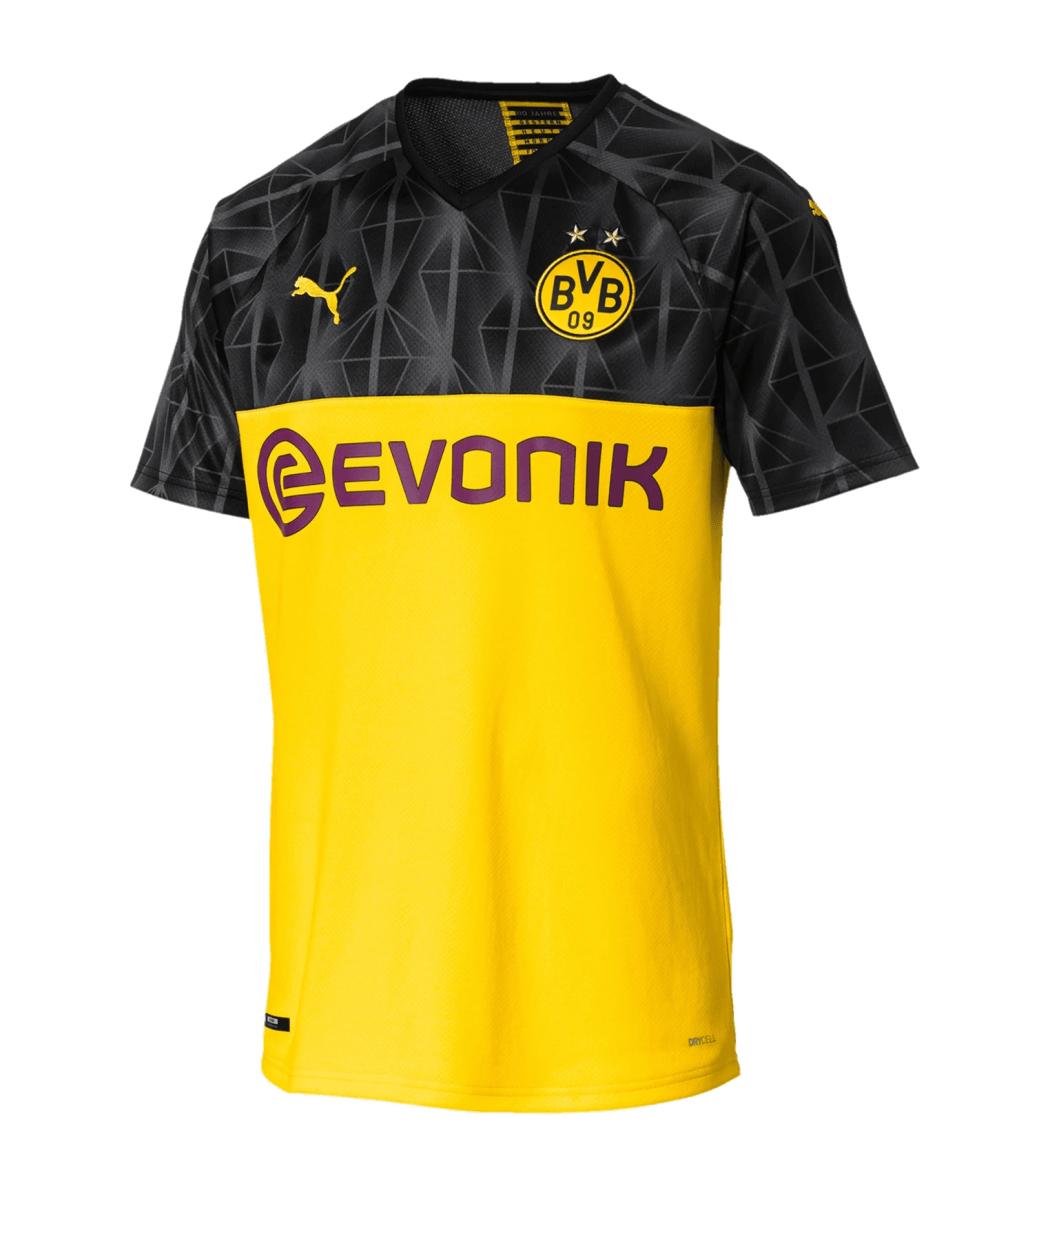 30% Rabatt bei Kicker.de auf Fanshop Artikel Bundesliga Serie A Premie League